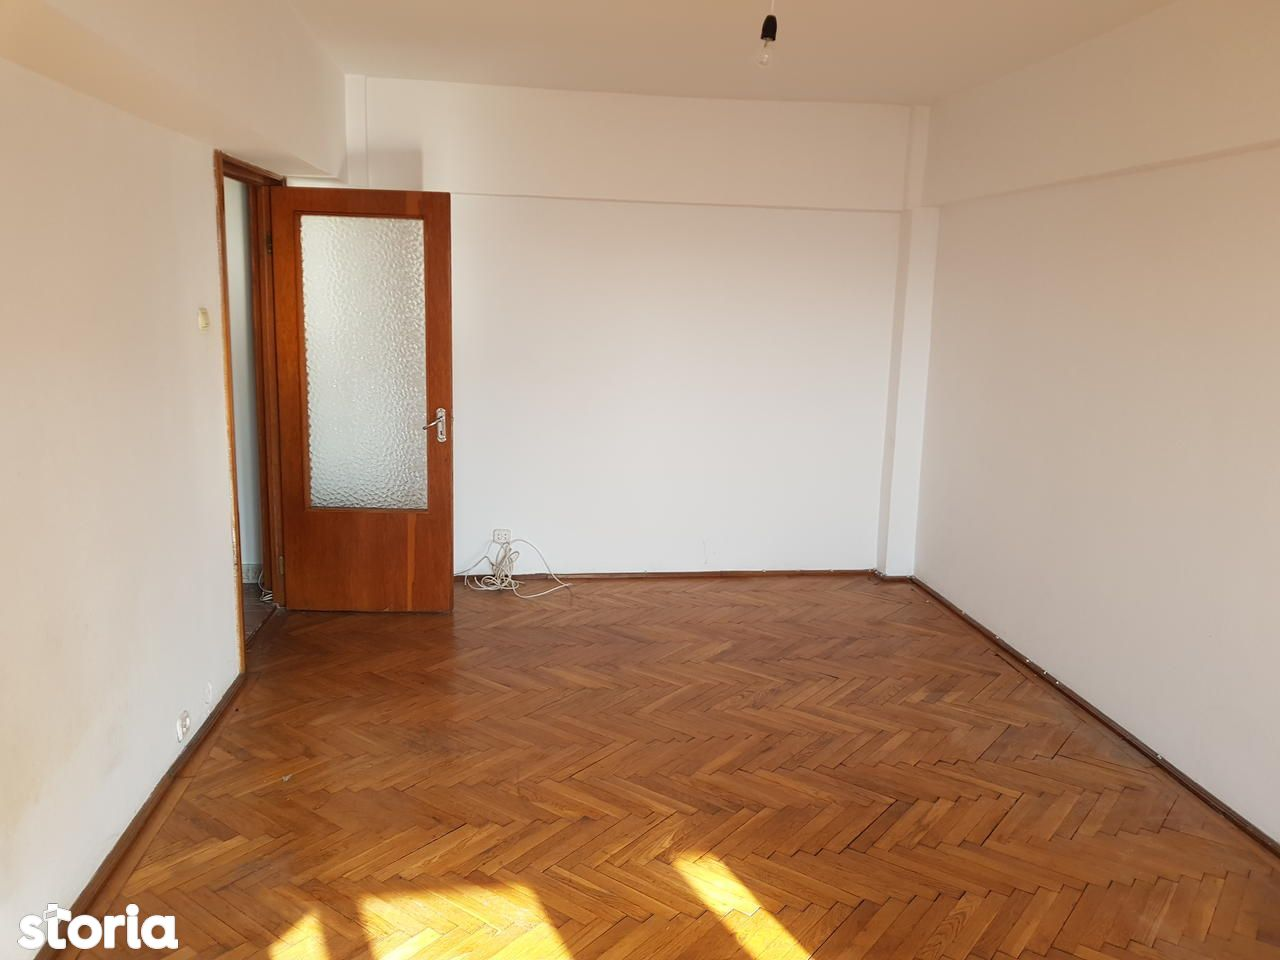 Apartament de vanzare, Constanța (judet), Bulevardul Aurel Vlaicu - Foto 4